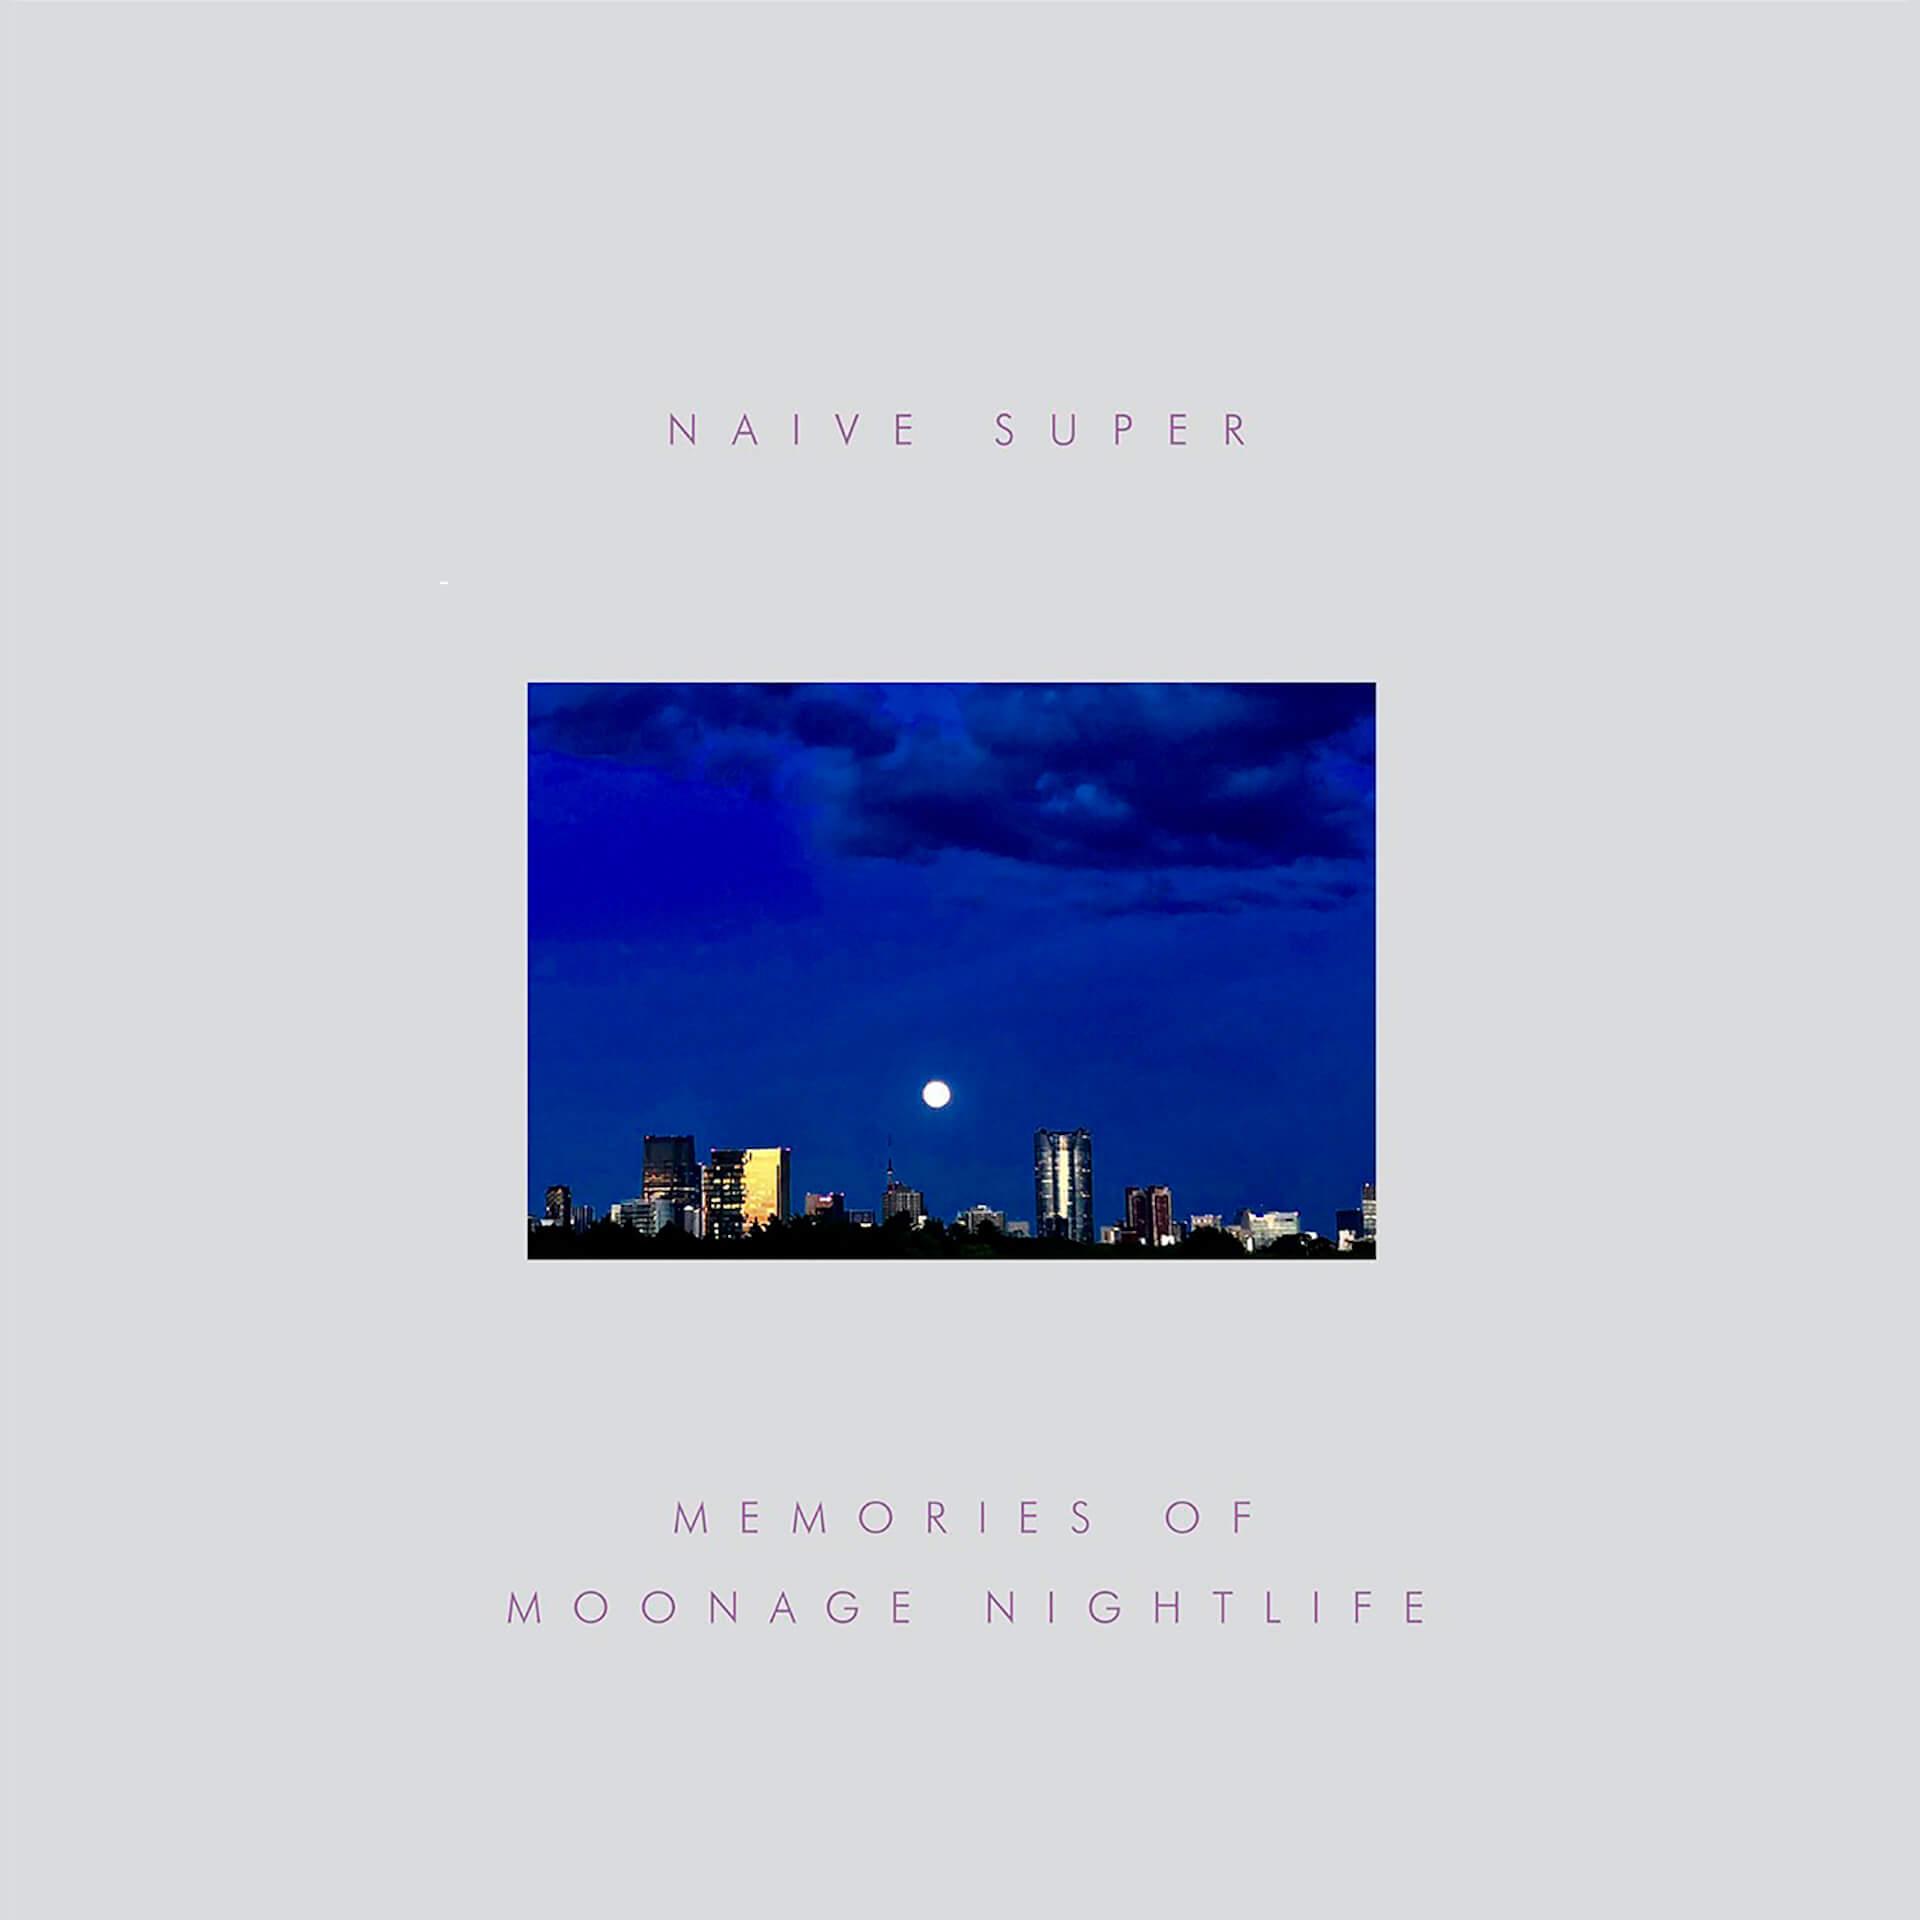 "Naive Superが野宮真貴を迎えた""Memories Of Moonage Nightlife""をリリース!「月」をテーマに連続リリースも決定 music200624_naivesuper_02"